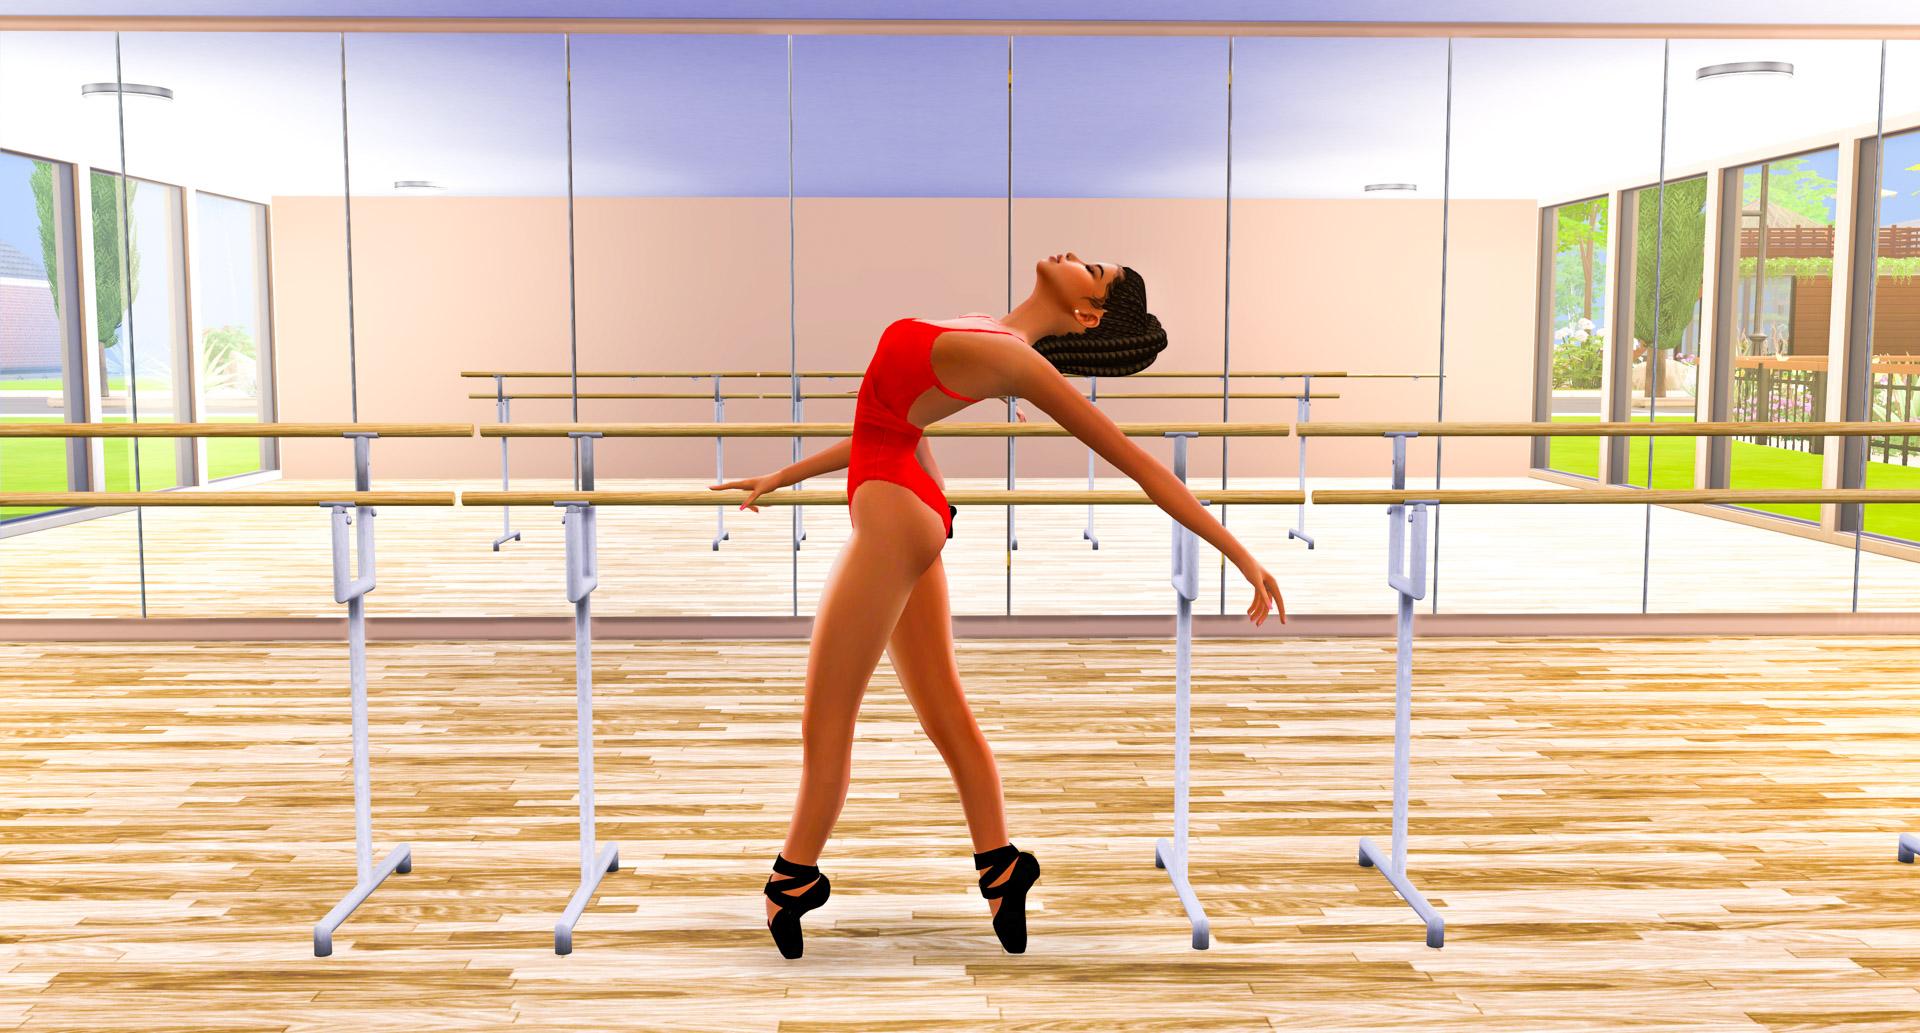 Sims 4 CC Custom Content Haul   Ballerina Ballet Student Lookbook   Ballerina Machinima   Desire Anne Gaming